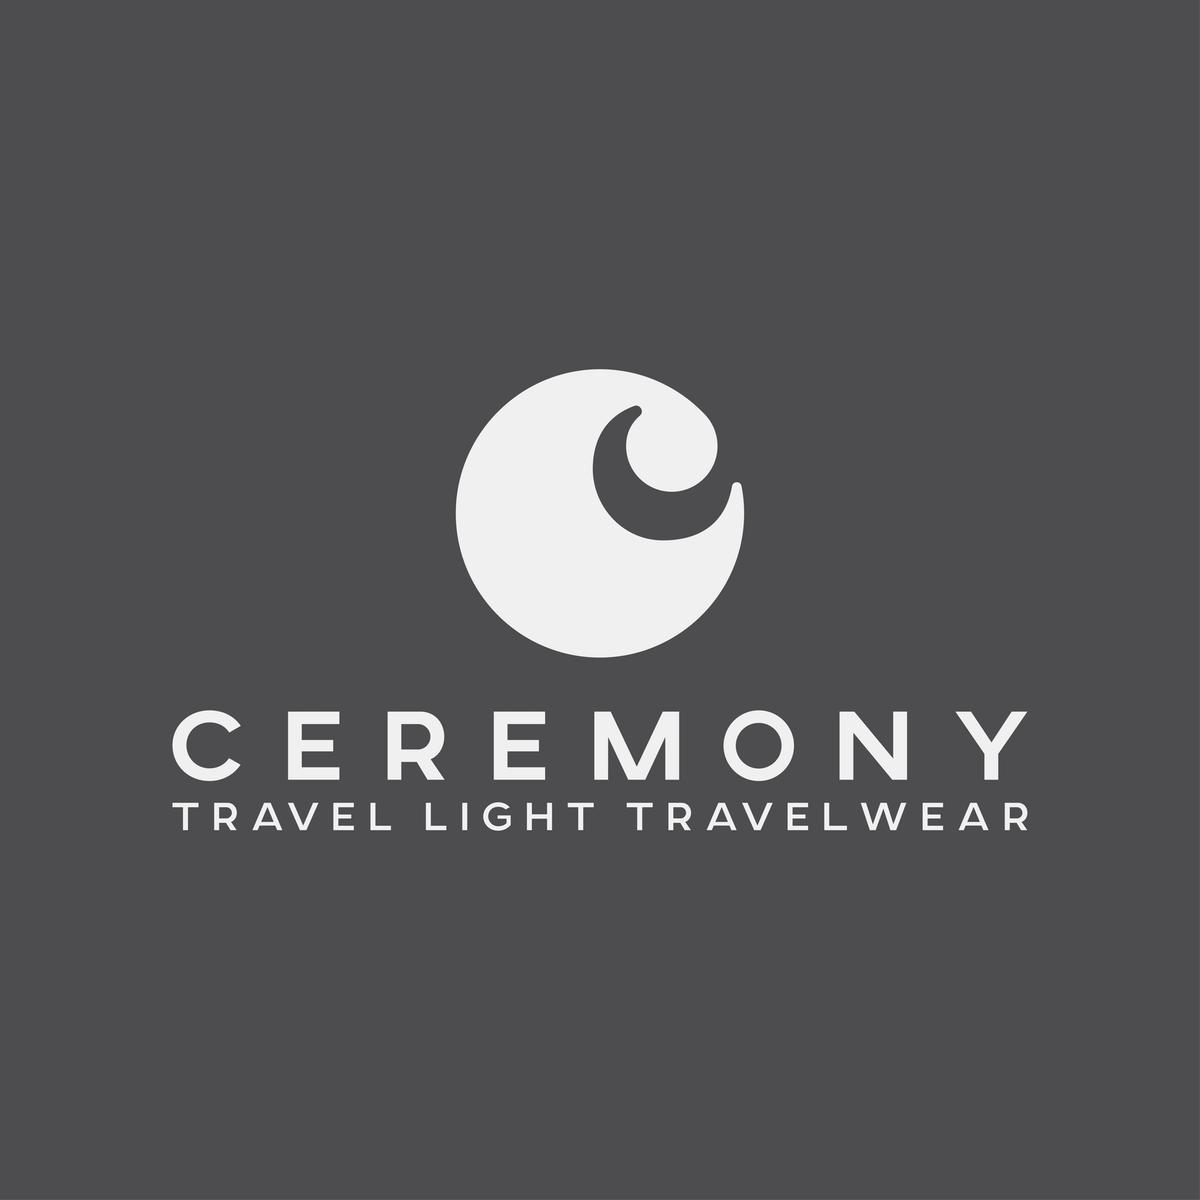 CEREMONY/ travel light travel wear